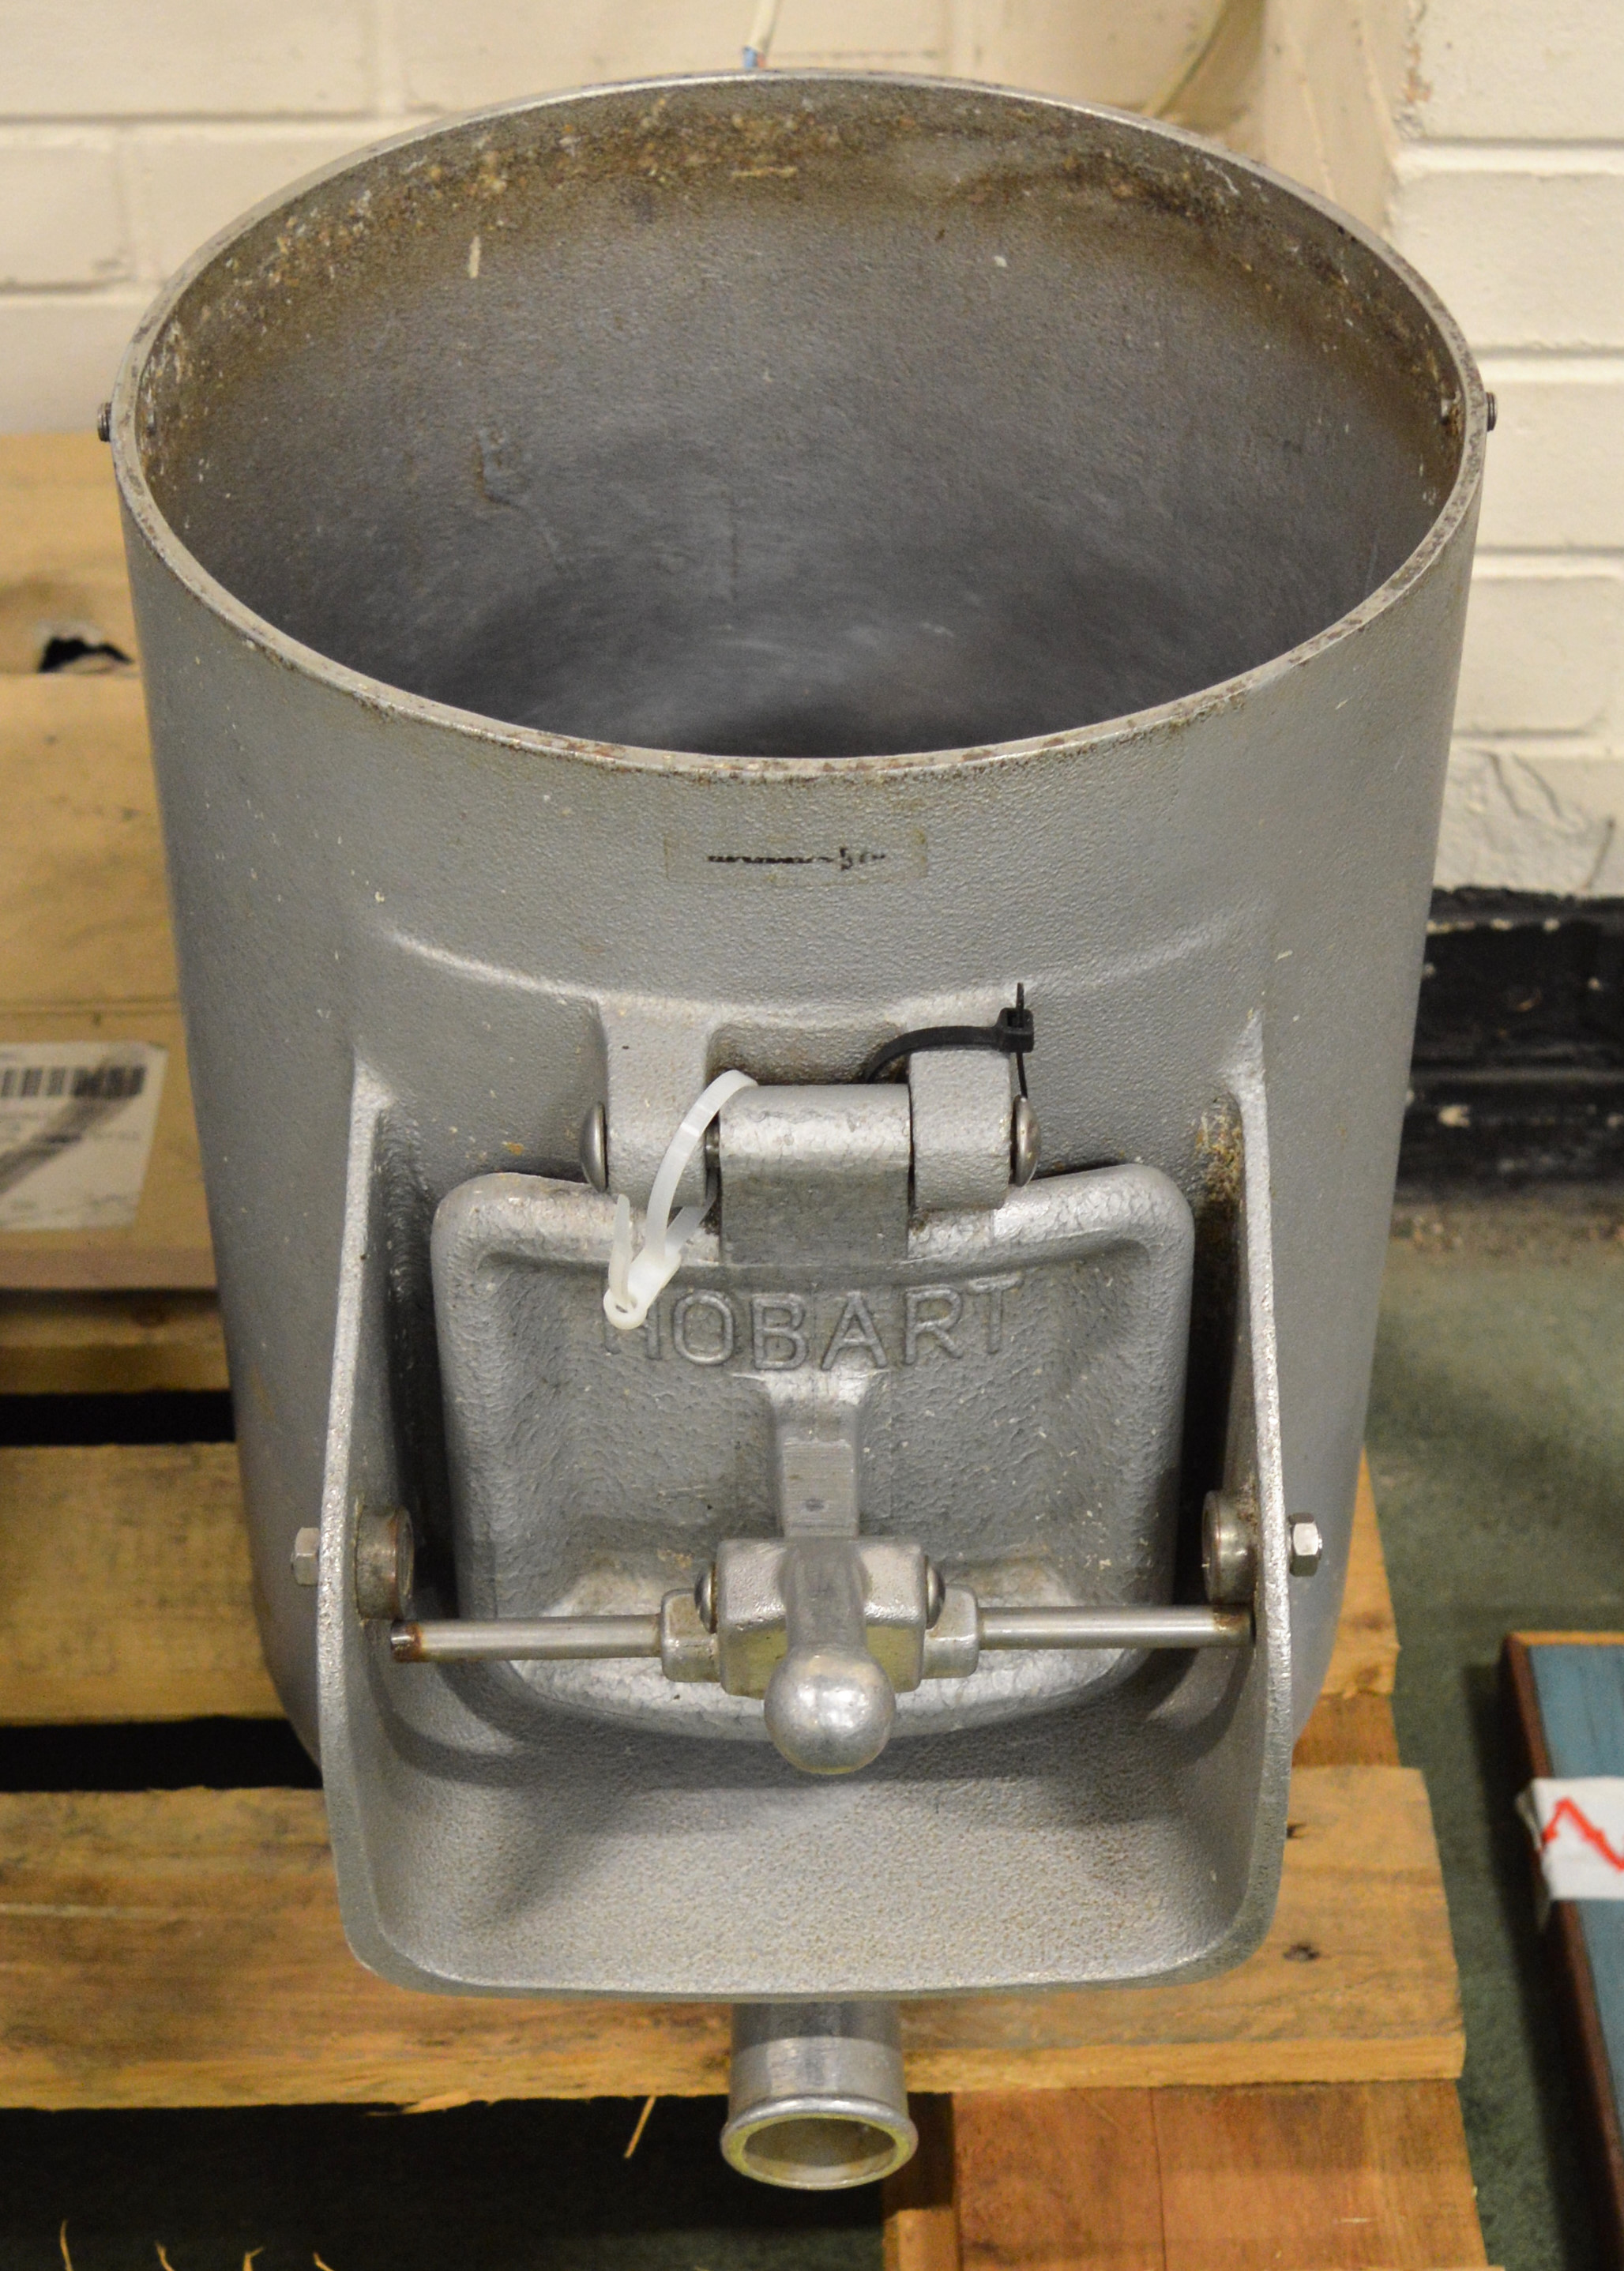 Lot 21 - Hobart E6414 Potato Peeler 14 lb Capacity - For spares or repair.